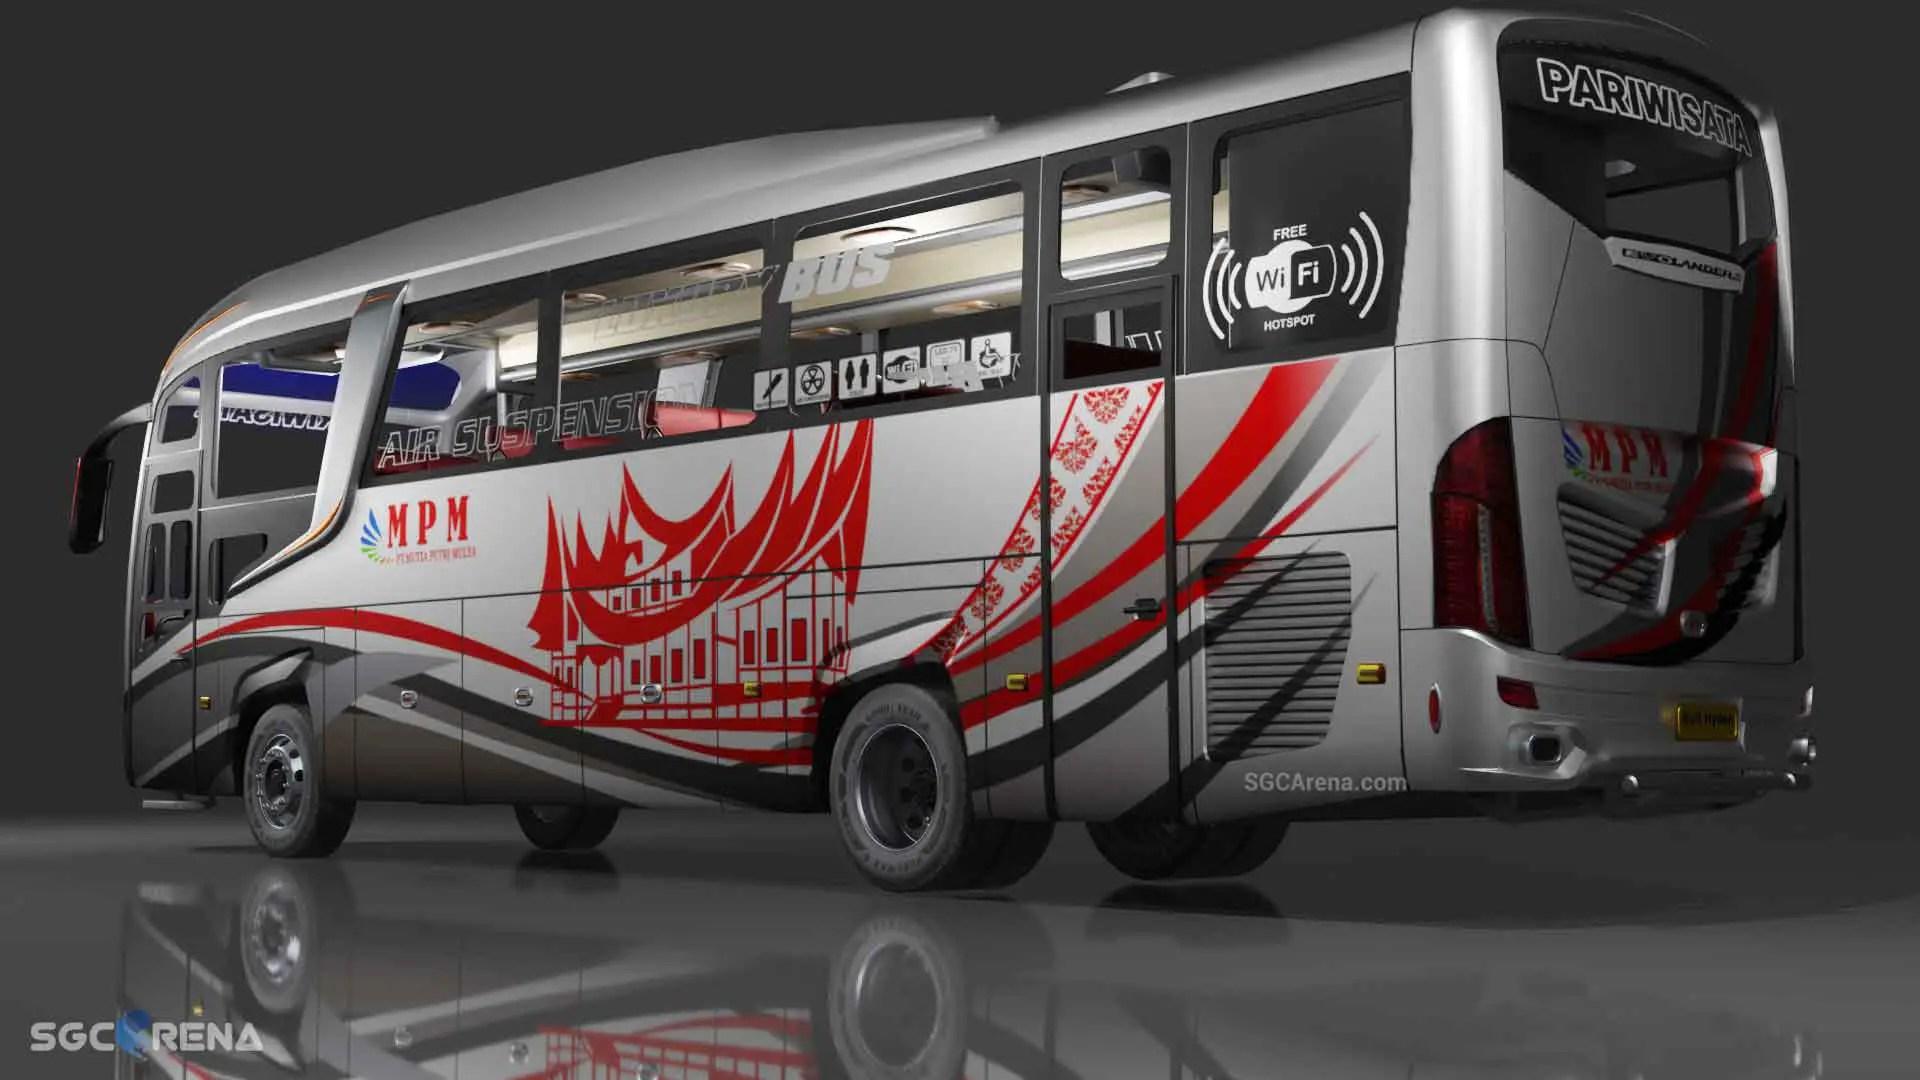 Download Evolander HD Bus Mod for Bus Simulator Indonesia, Evolander HD, BUSSID Bus Mod, BUSSID mod, Evolander Bus Mod, Rull Hyden